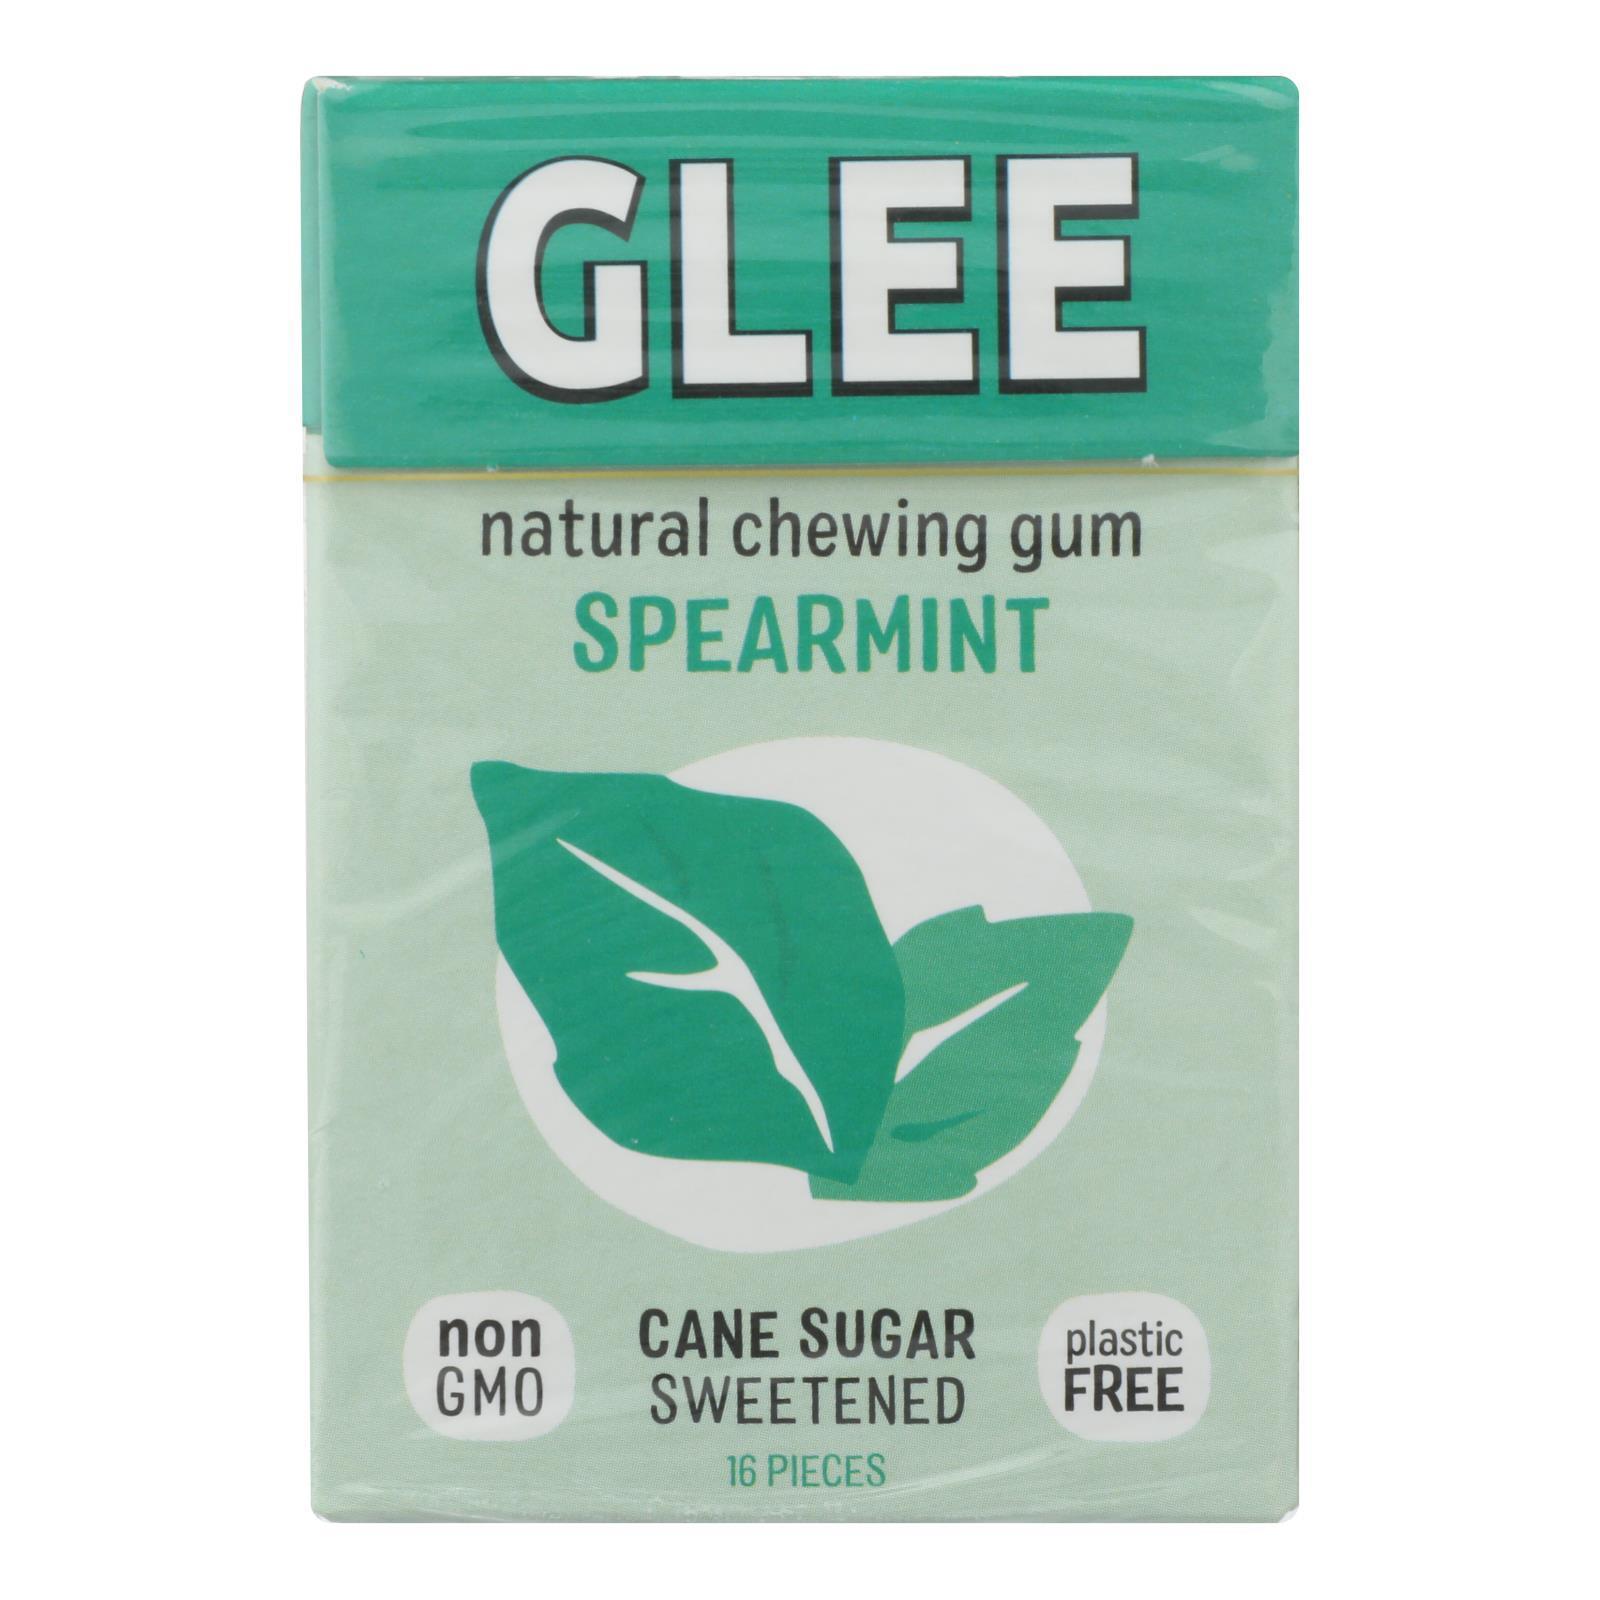 Glee Gum Chewing Gum - Spearmint - Case of 12 - 16 Pieces